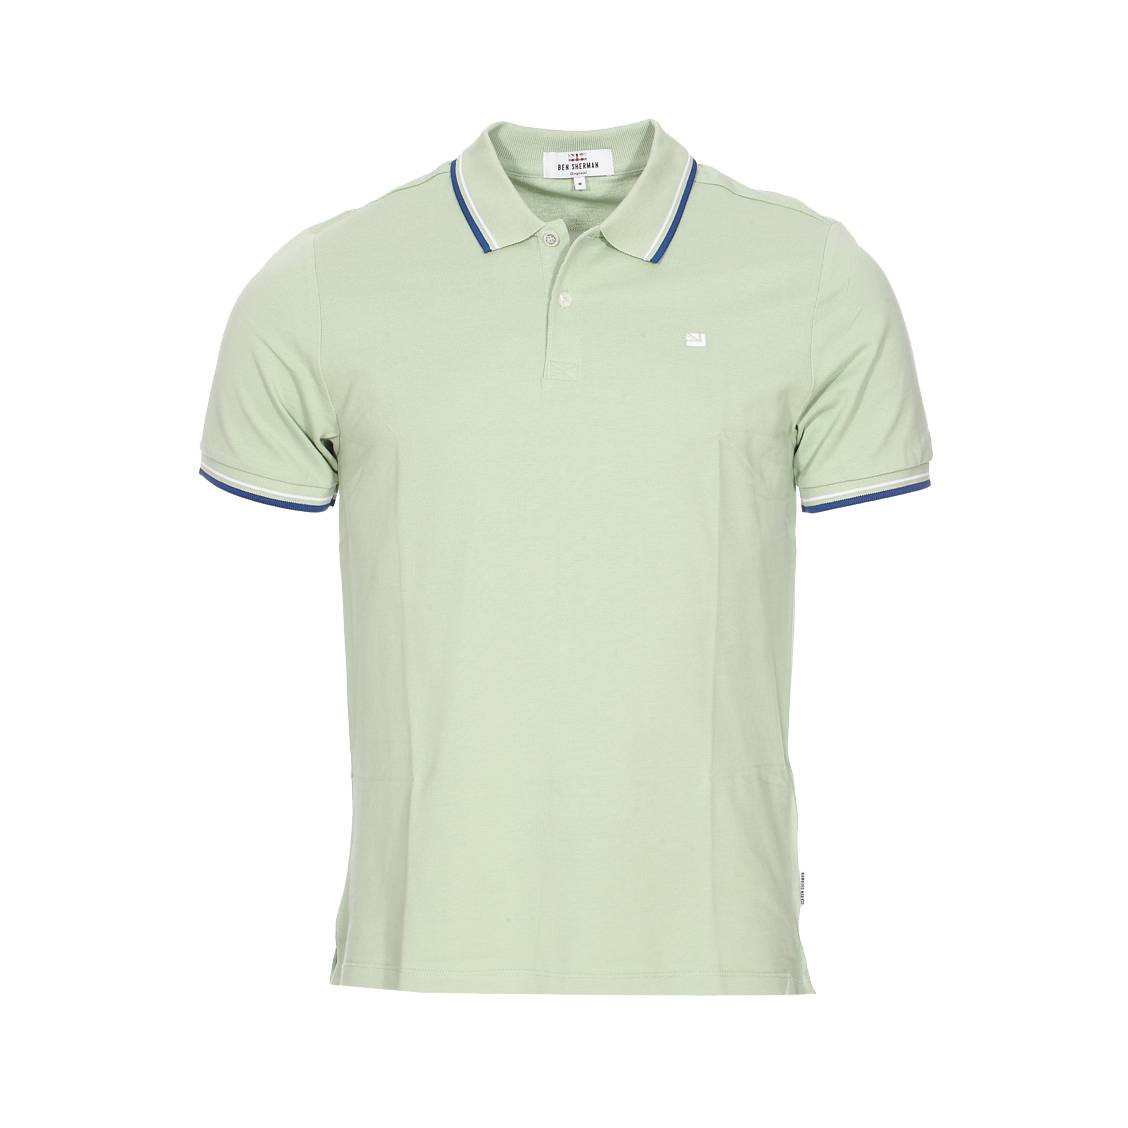 Polo  the romford en piqué de coton vert pâle